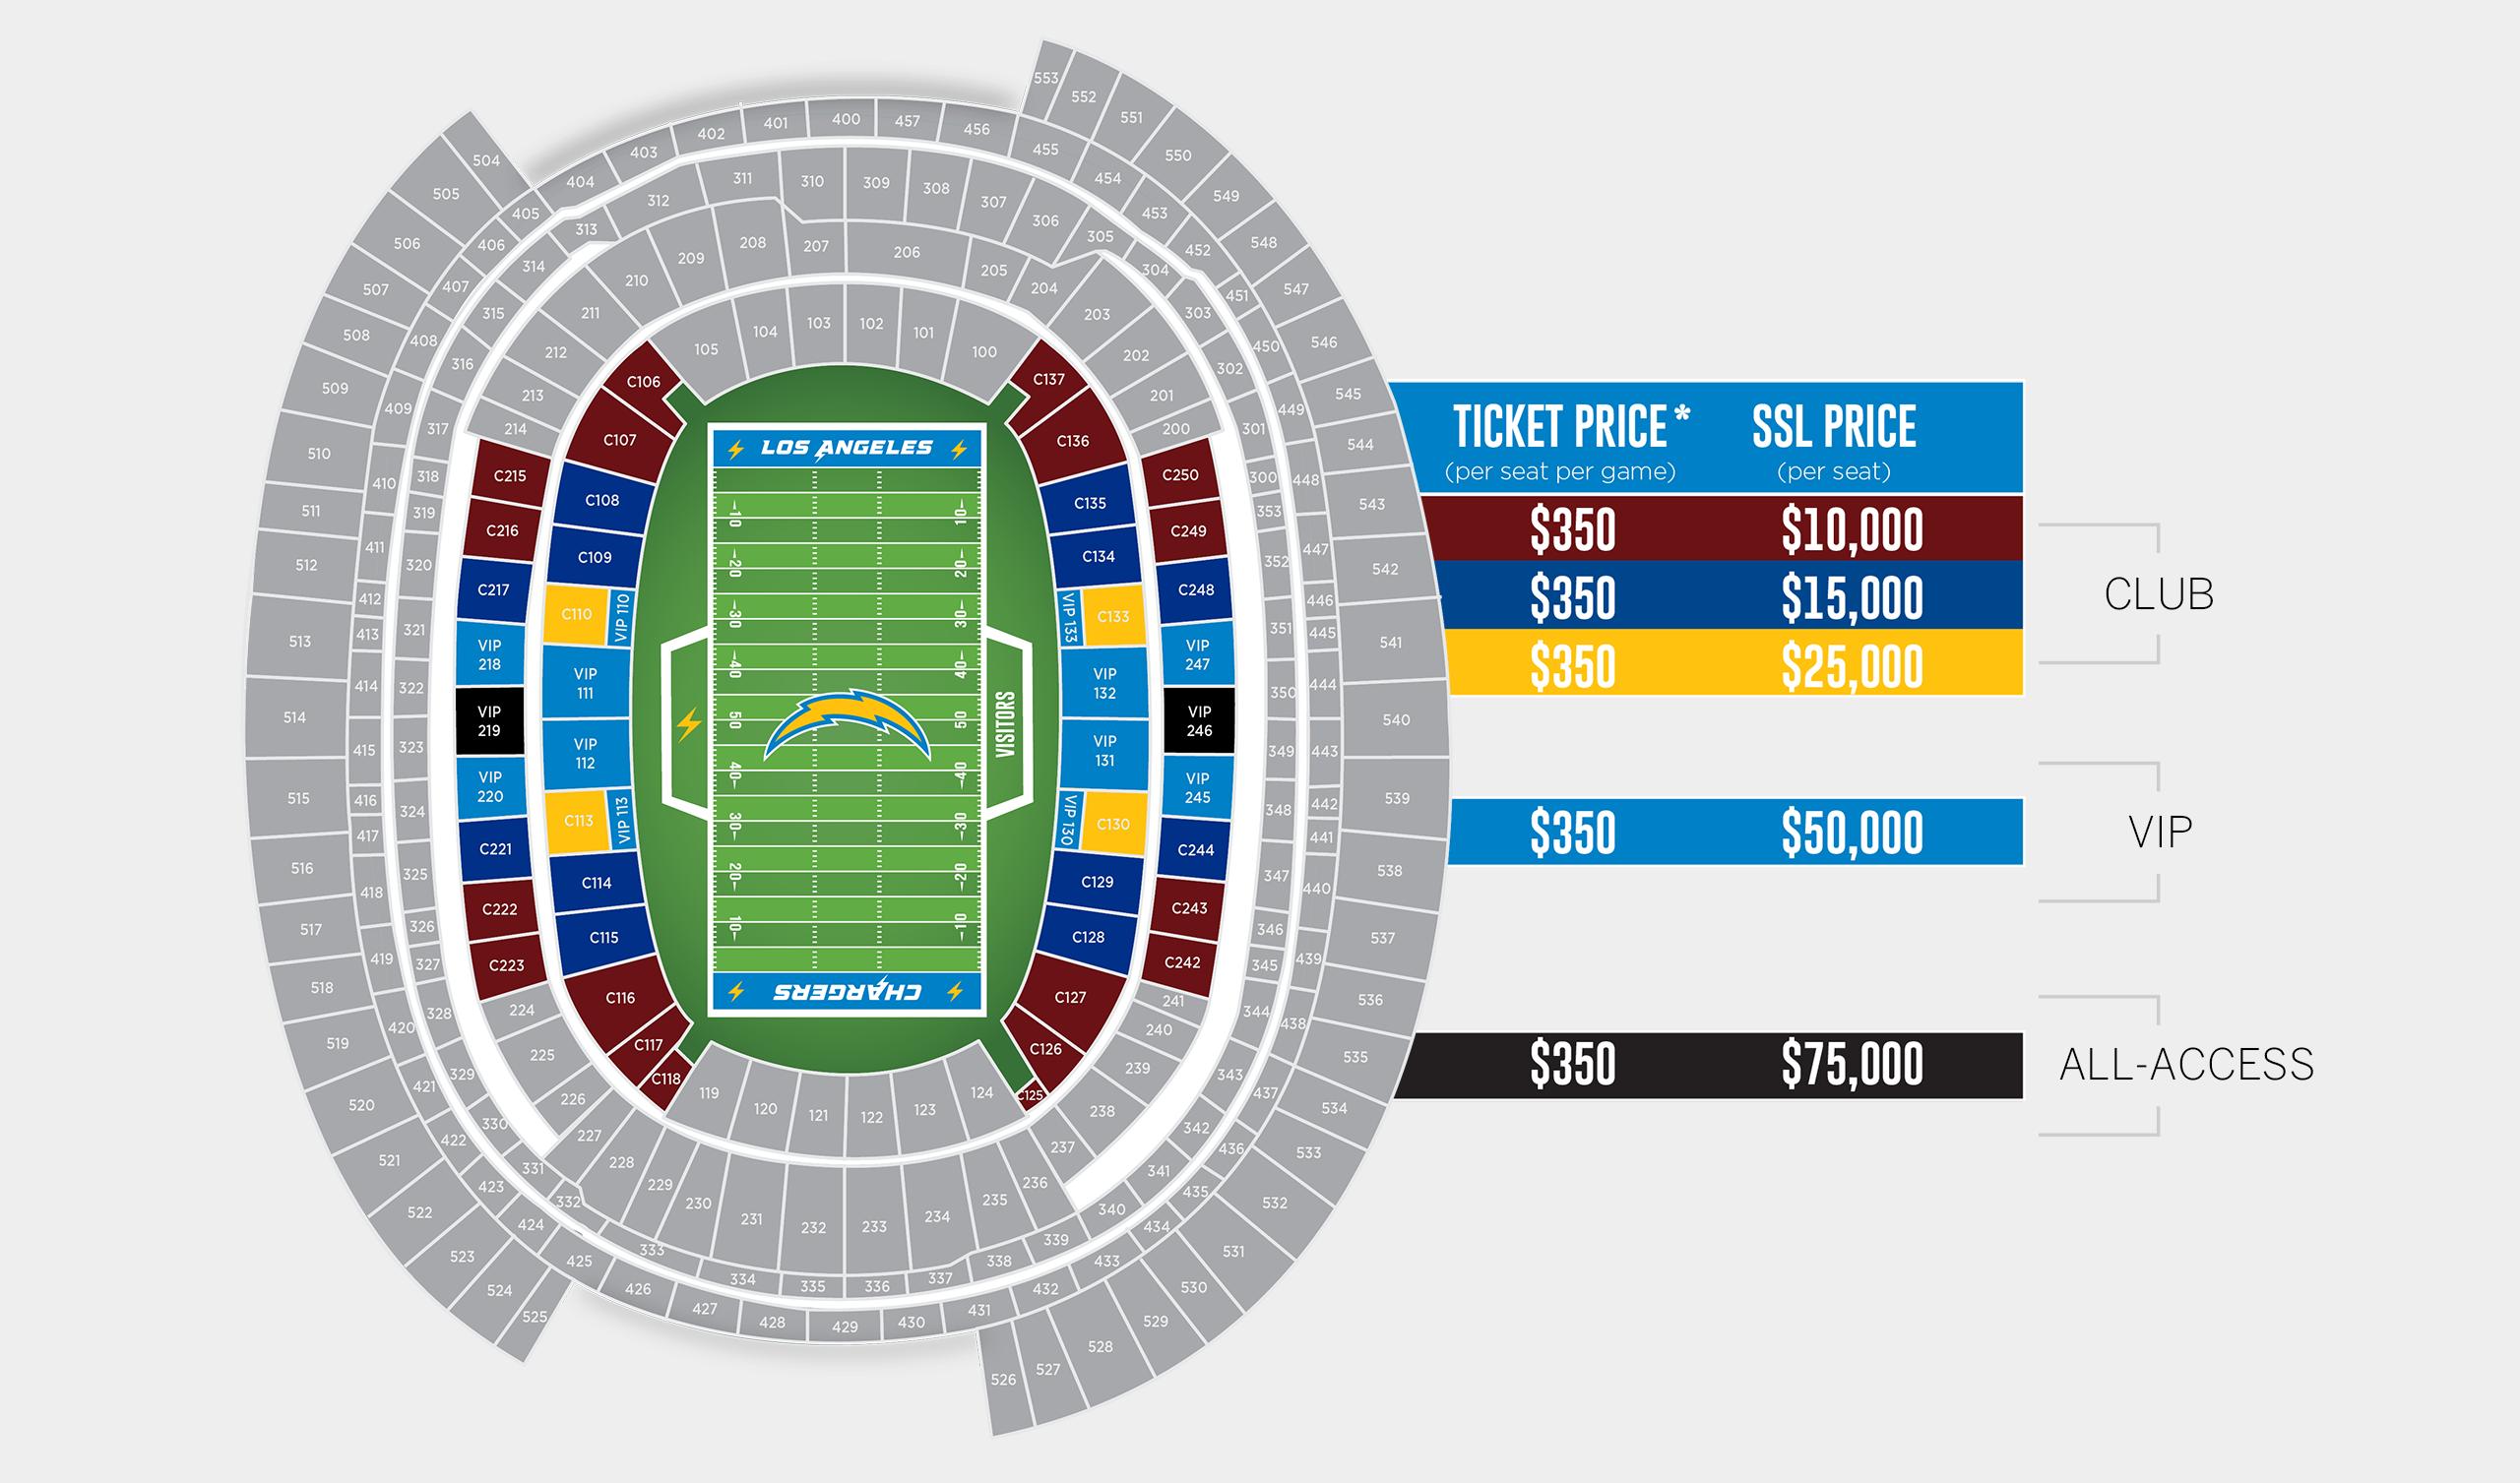 201013_Site_Club_Landing_Page_Stadium_Map